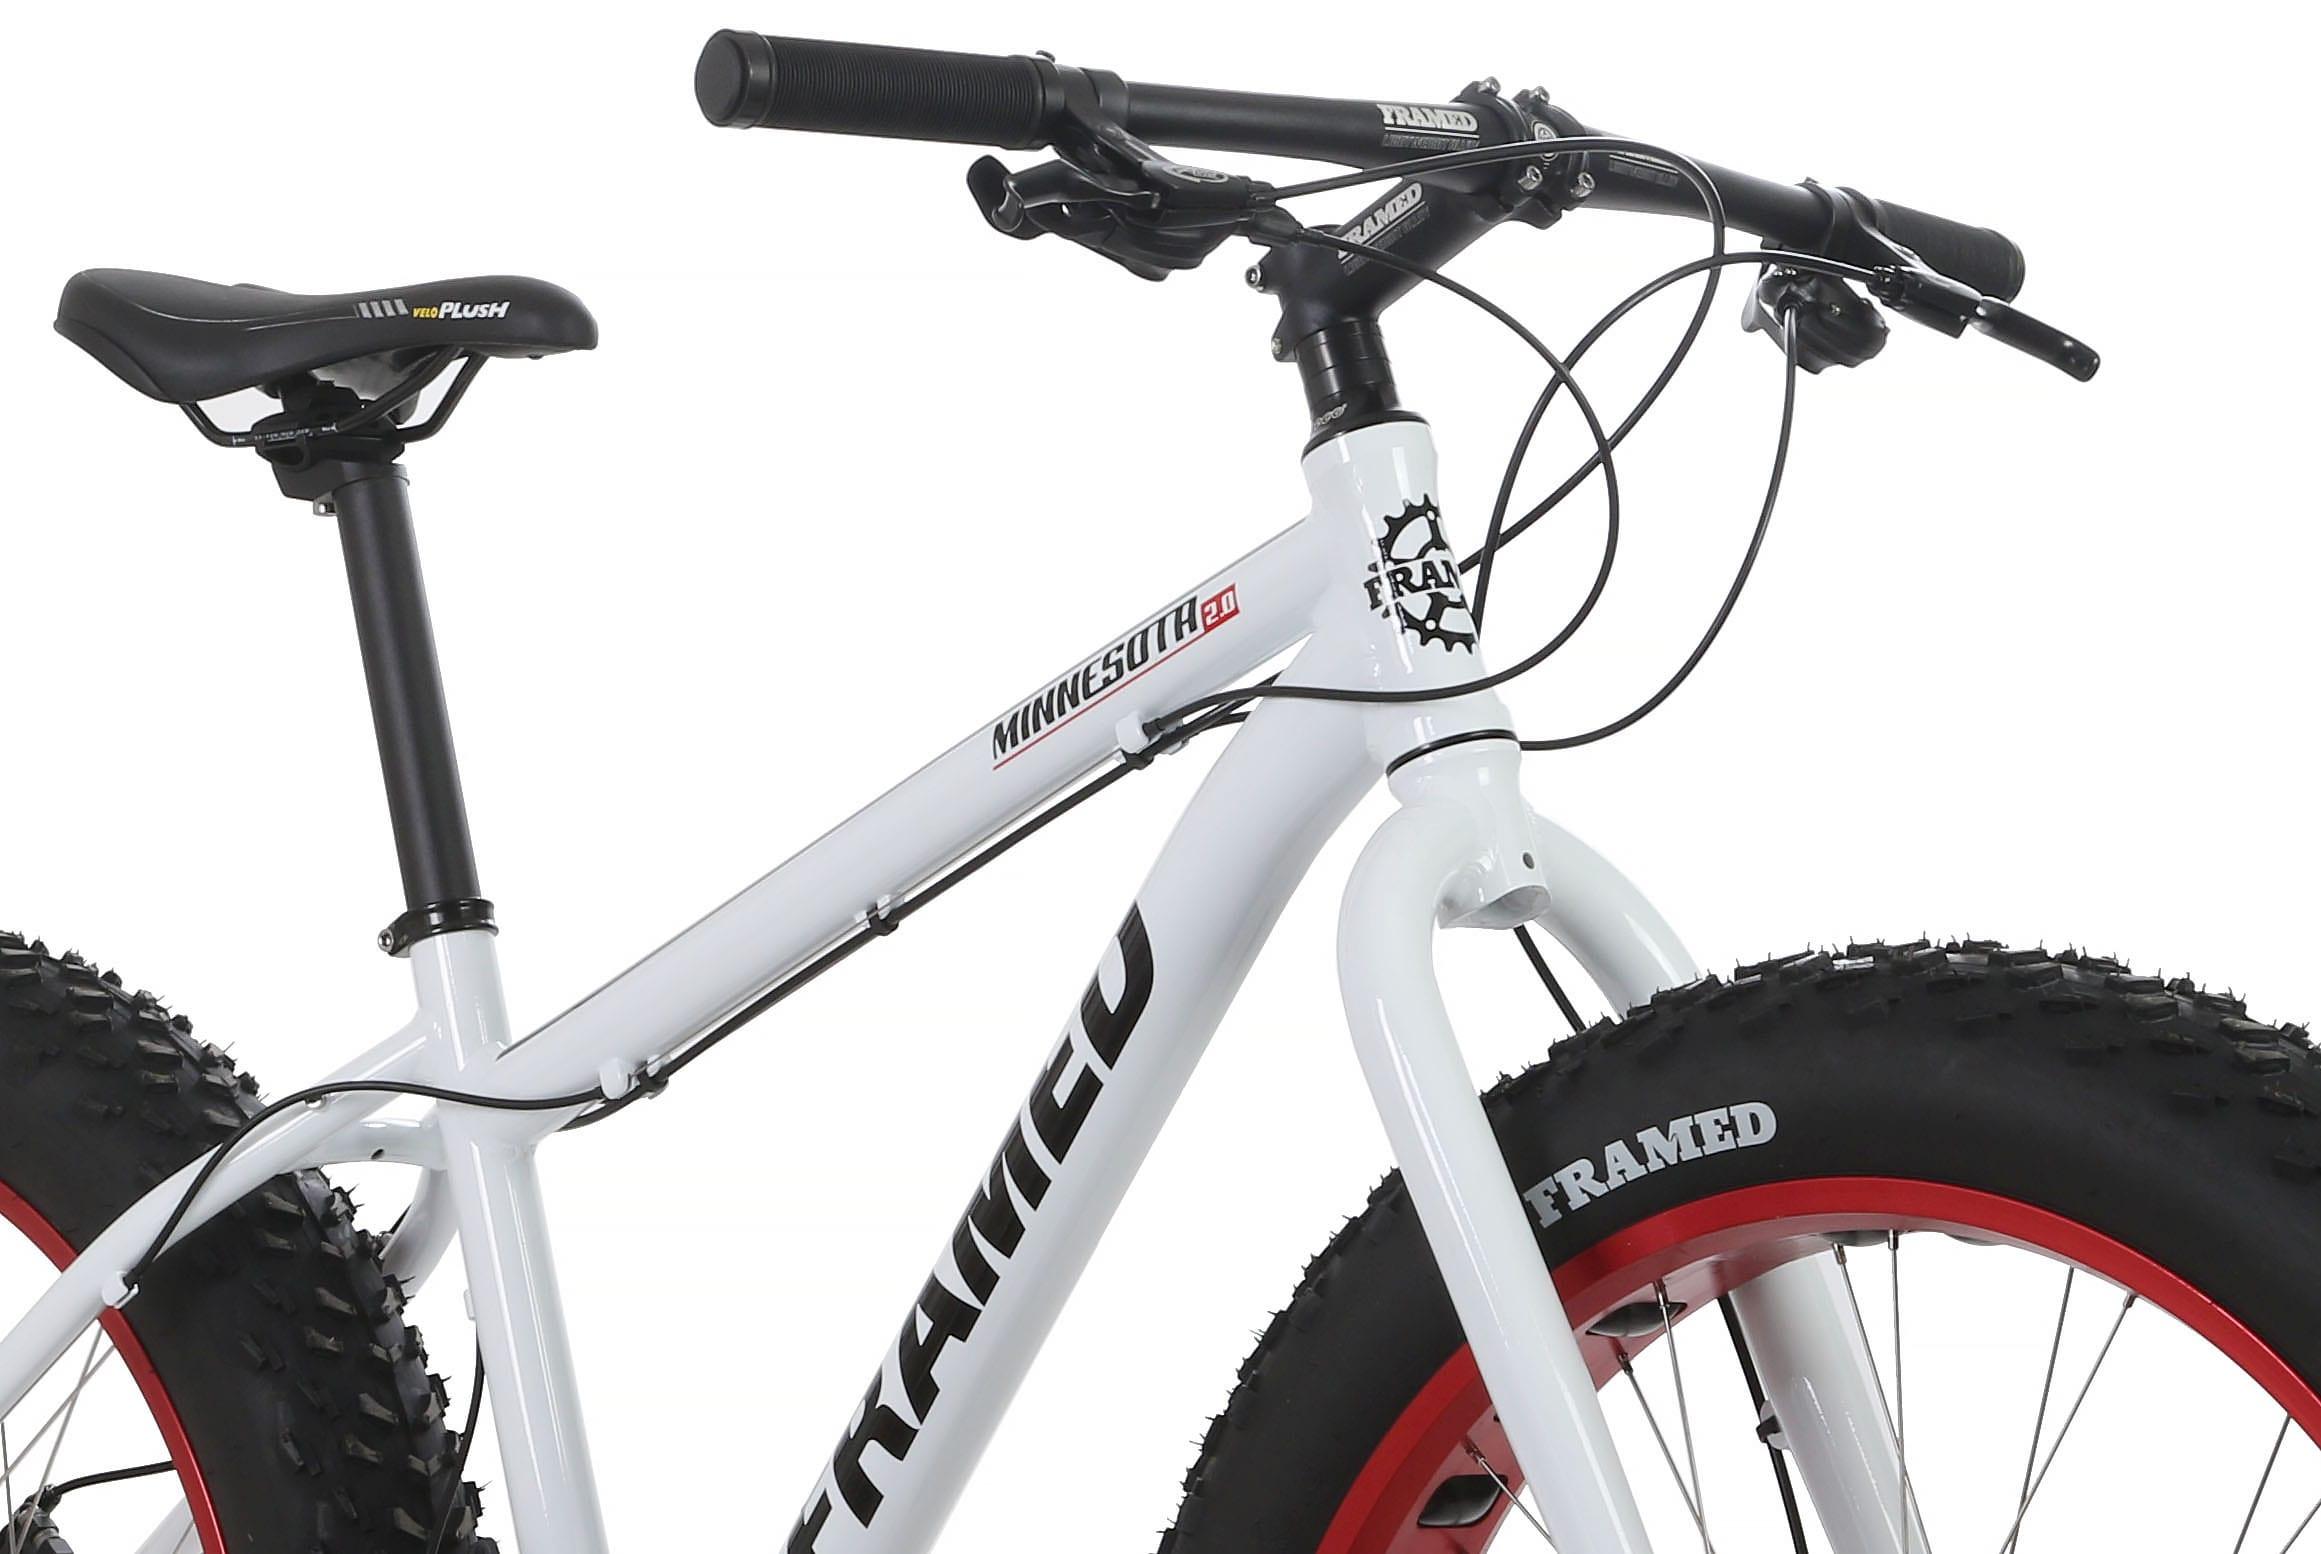 On Sale Framed Minnesota 2.0 Fat Bike 2018